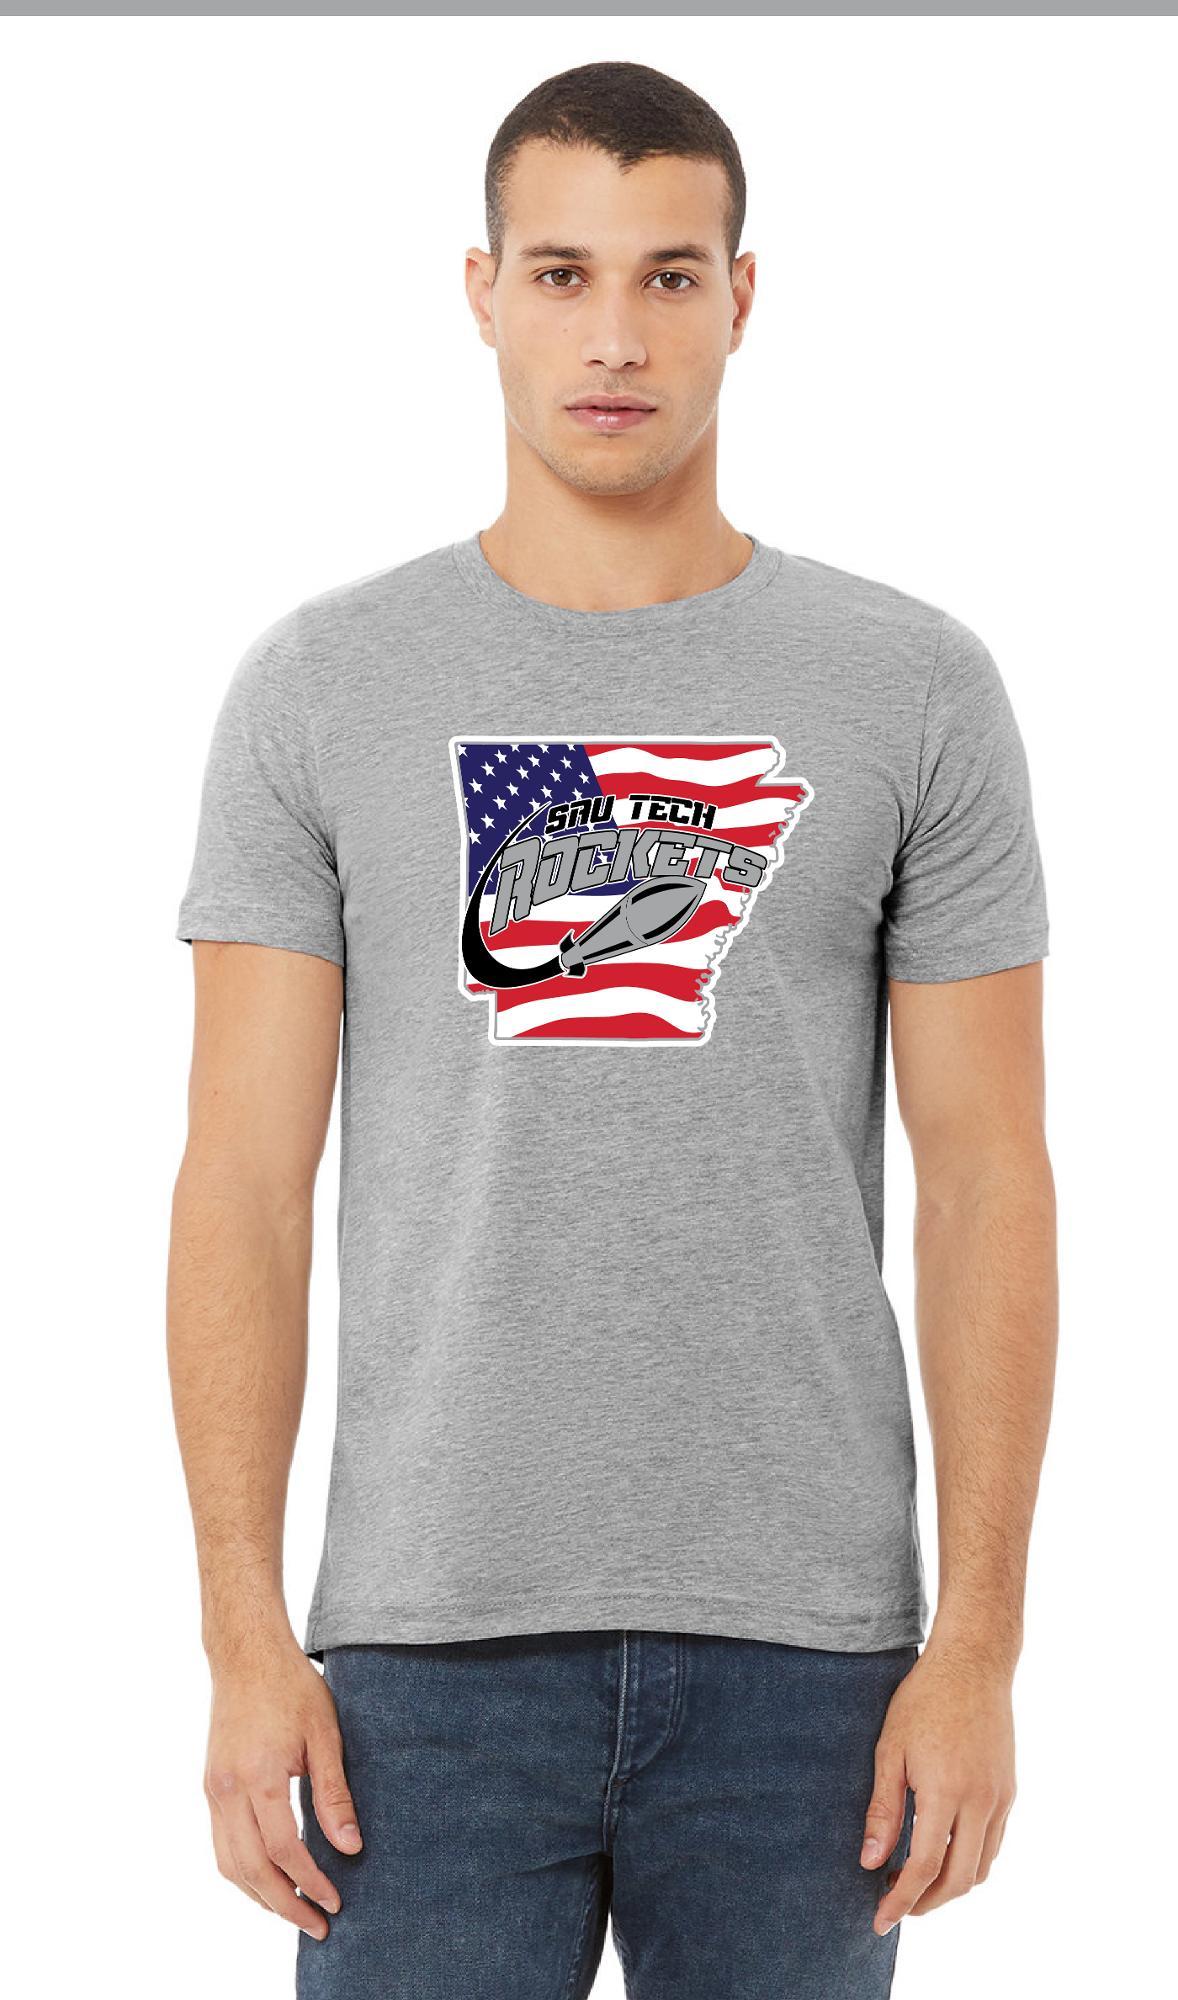 image of: SAU Tech Arkansas Flag Short Sleeve Tee